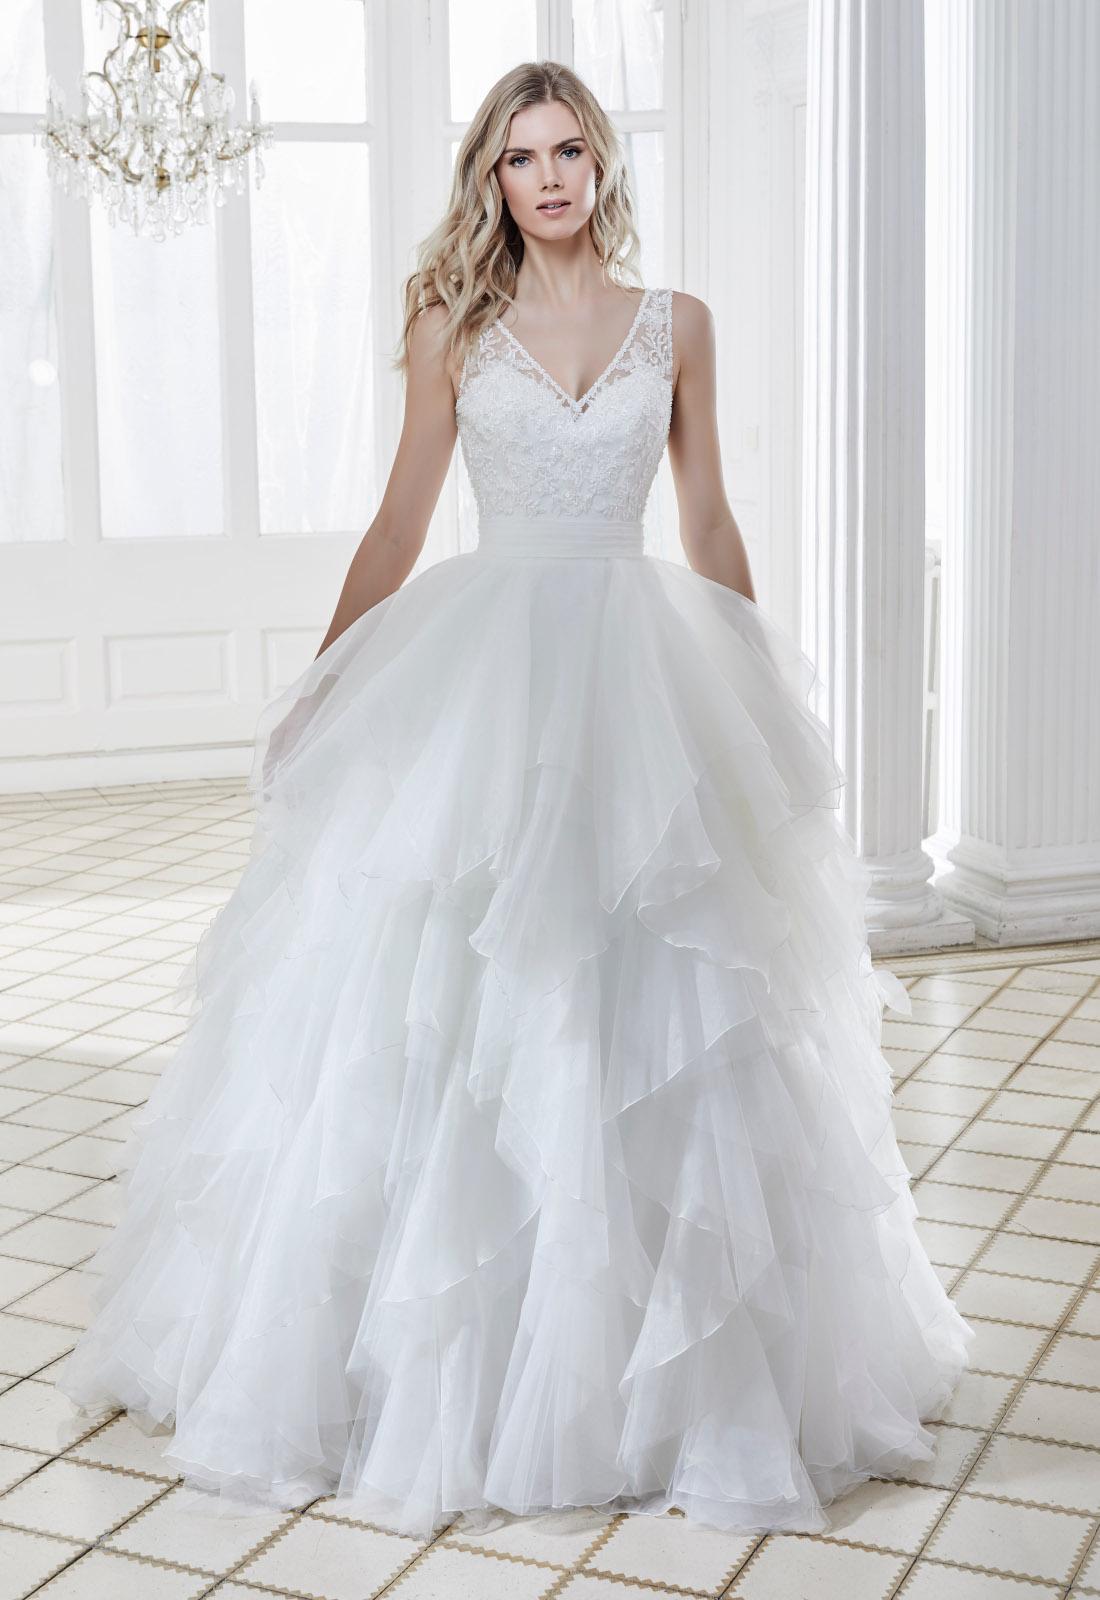 Robe de Mariée DS202-02 Divina Sposa